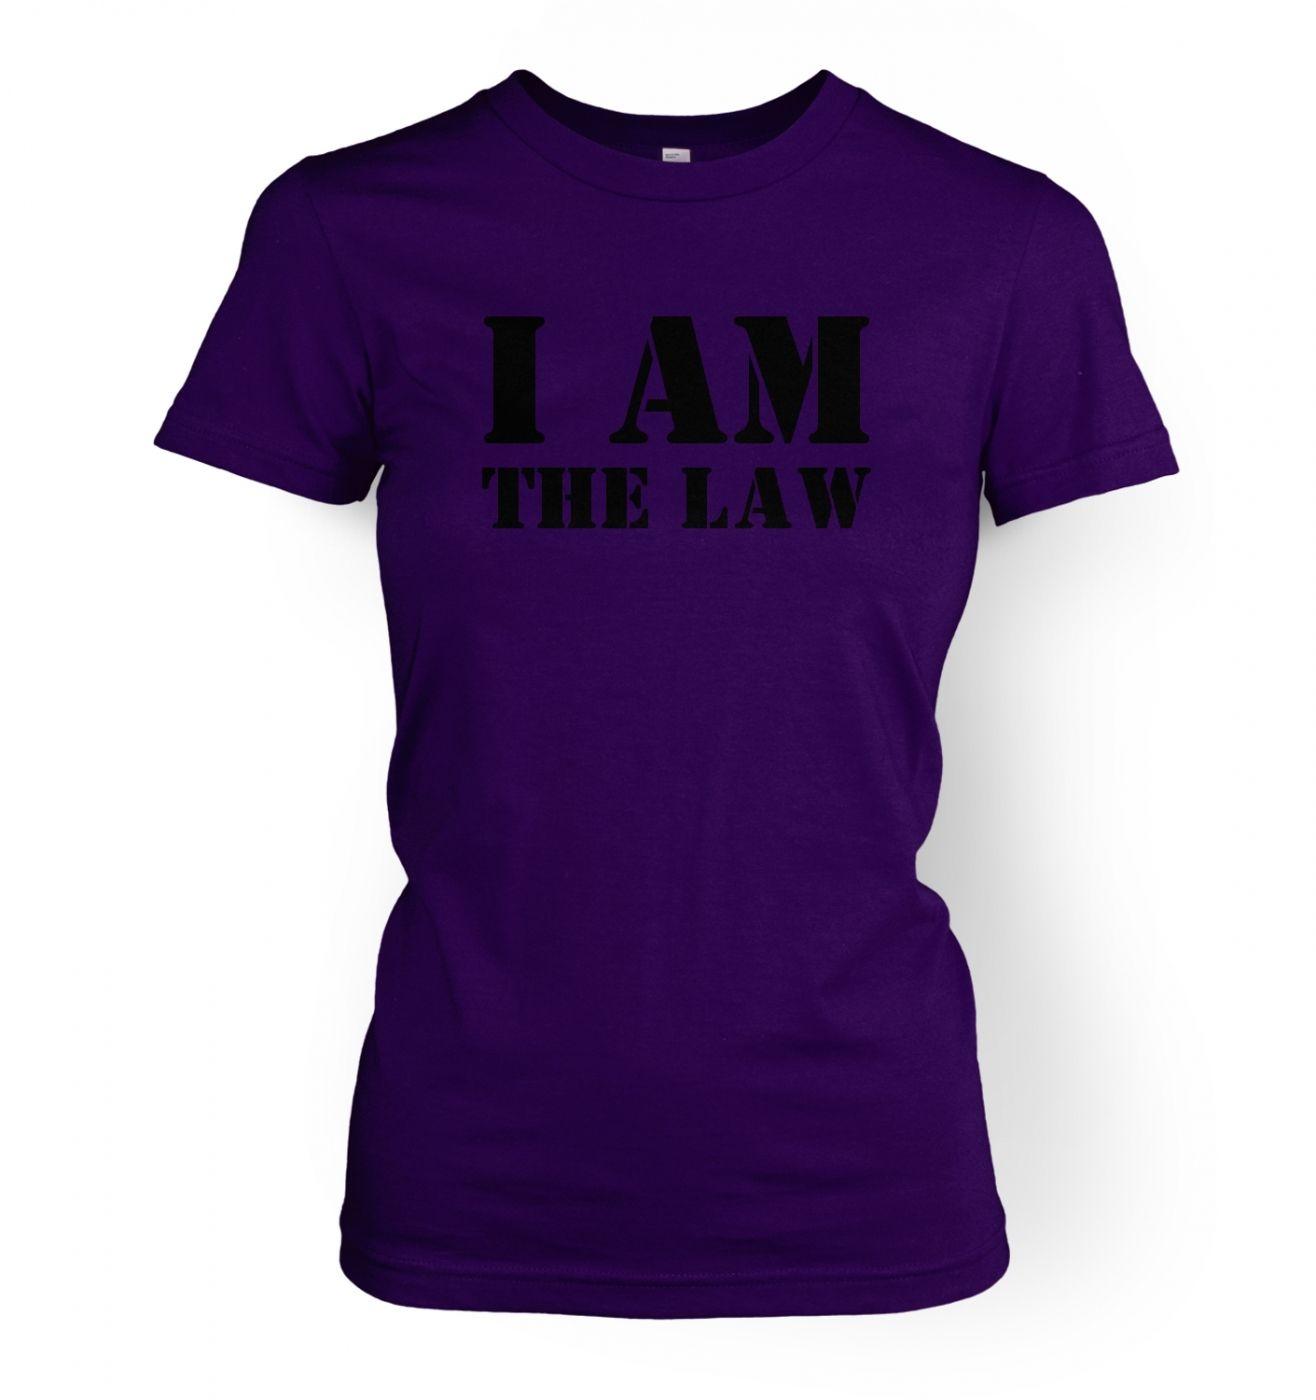 I am the law women's t-shirt